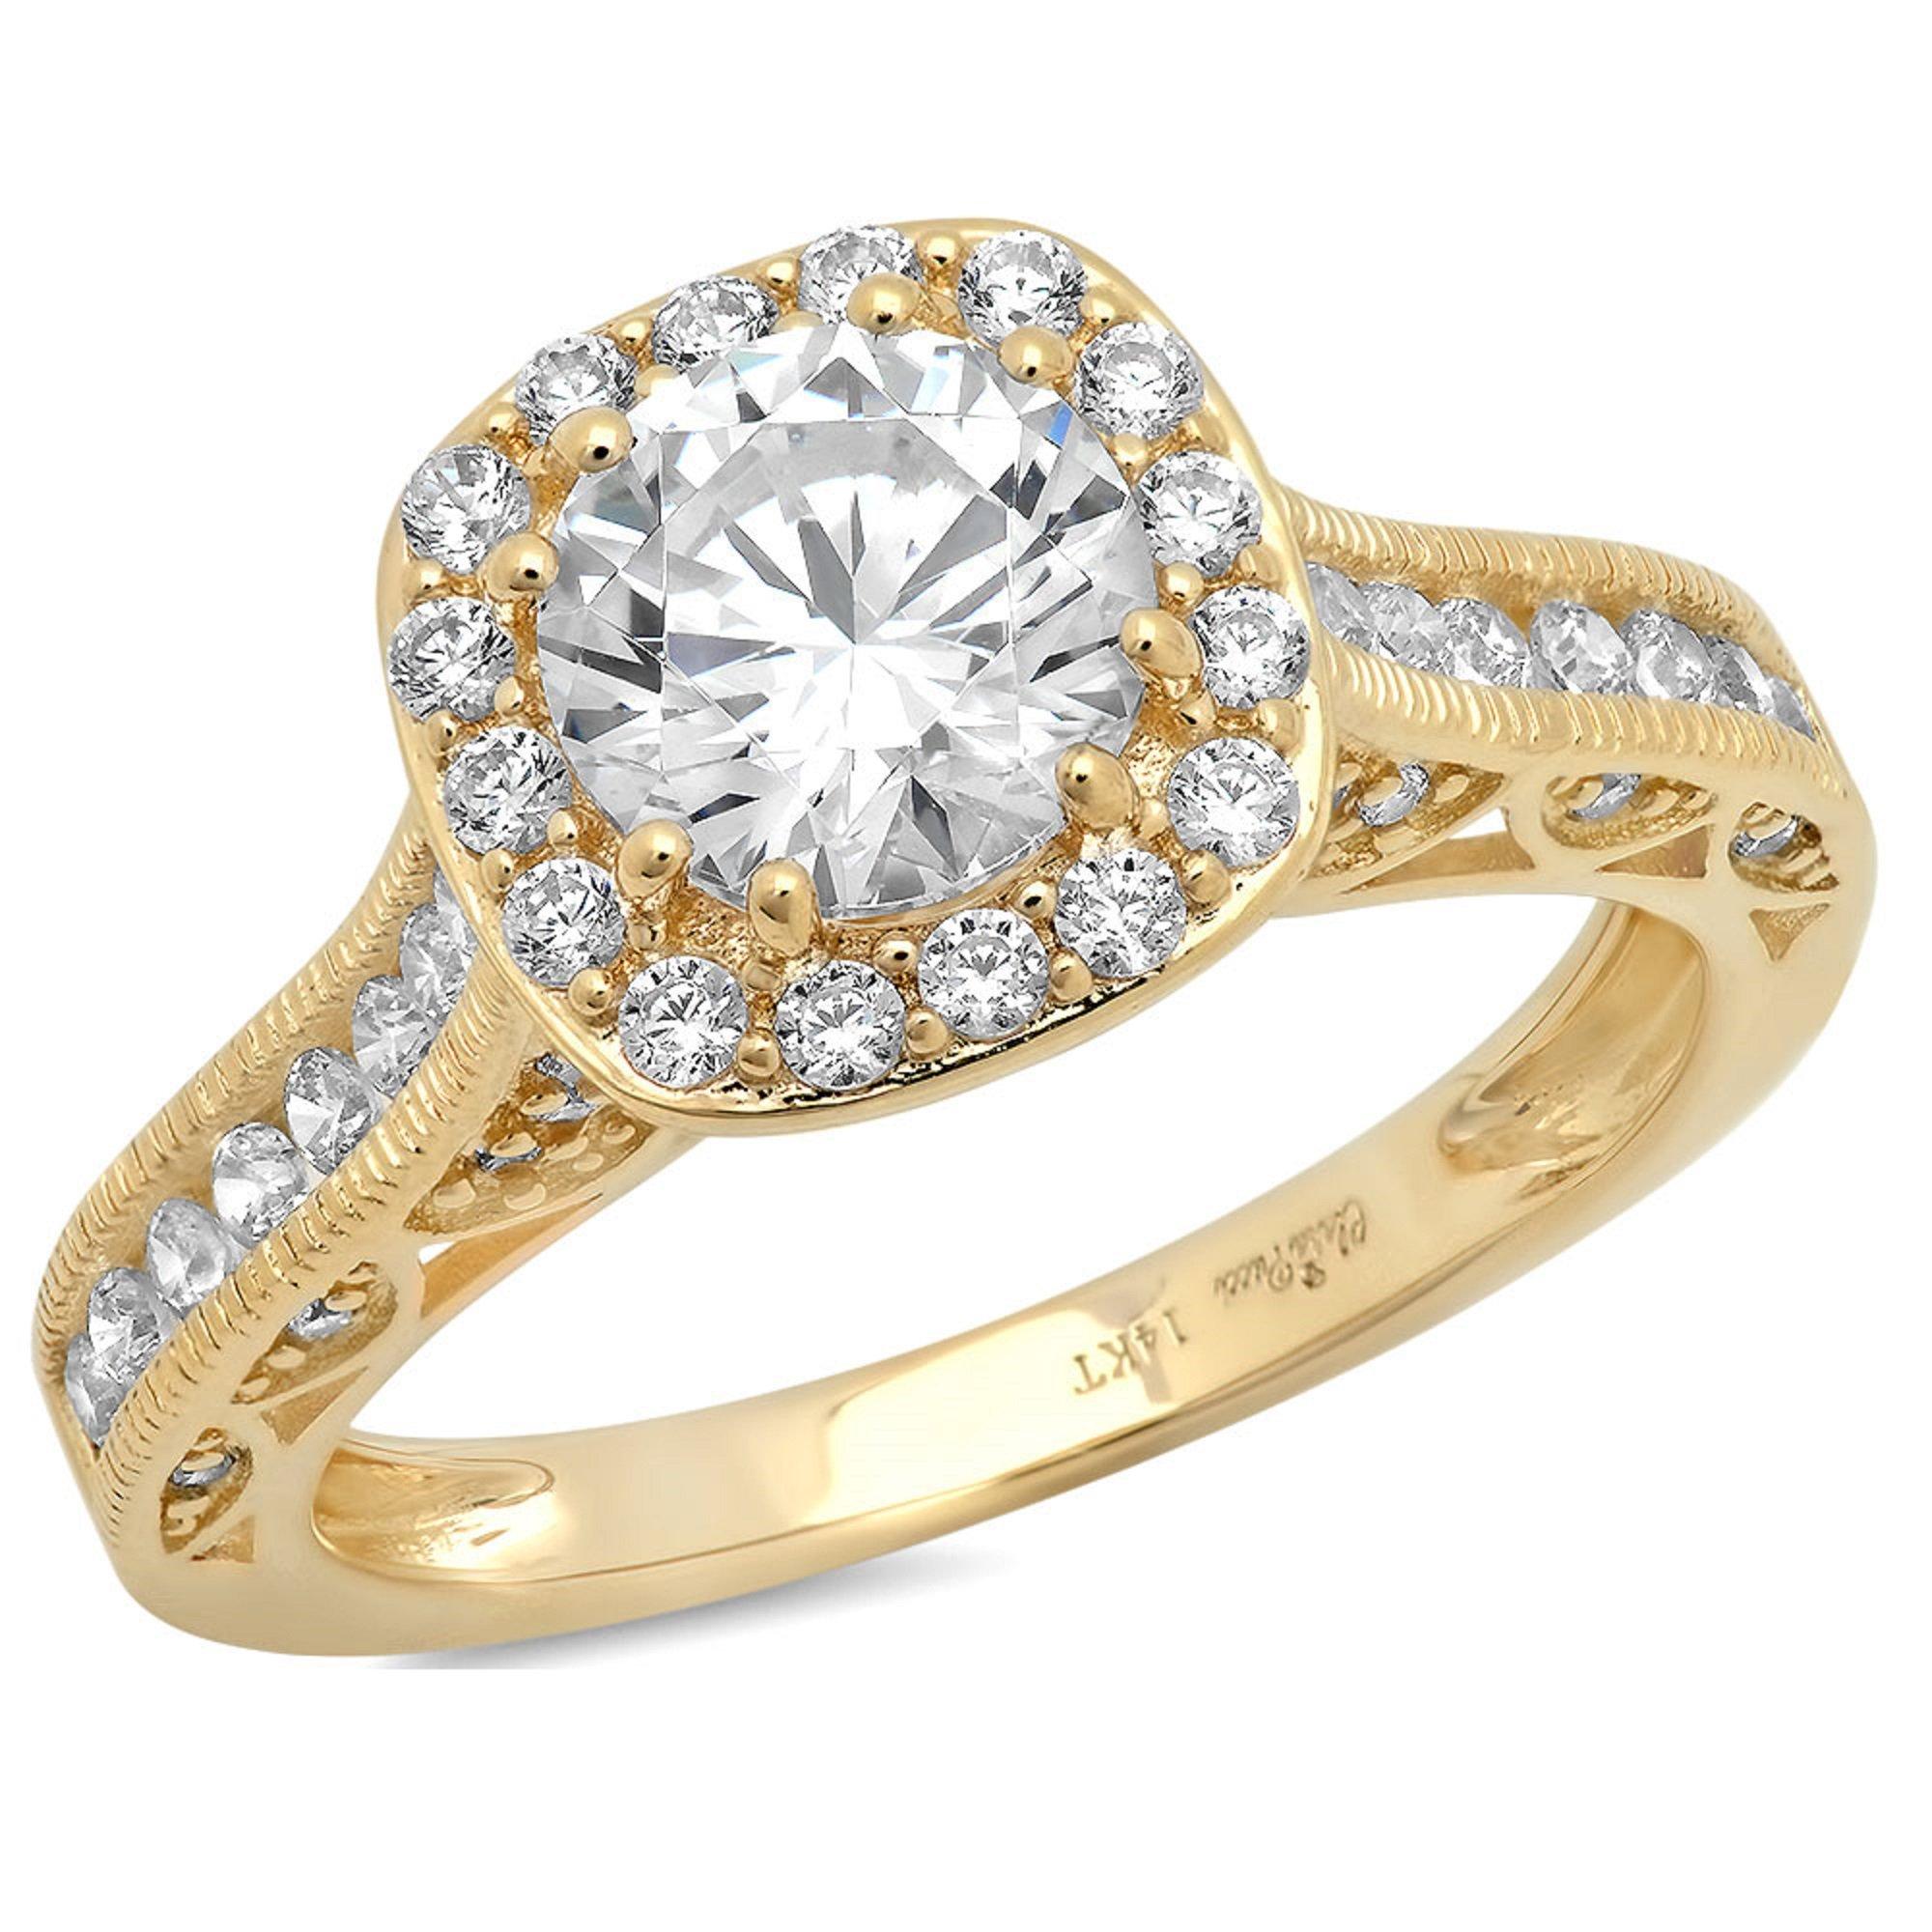 Clara Pucci 2.0 CT Round Cut CZ Pave Halo Wedding Bridal Engagement Ring Band 14k Yellow Gold, Size 3.75 by Clara Pucci